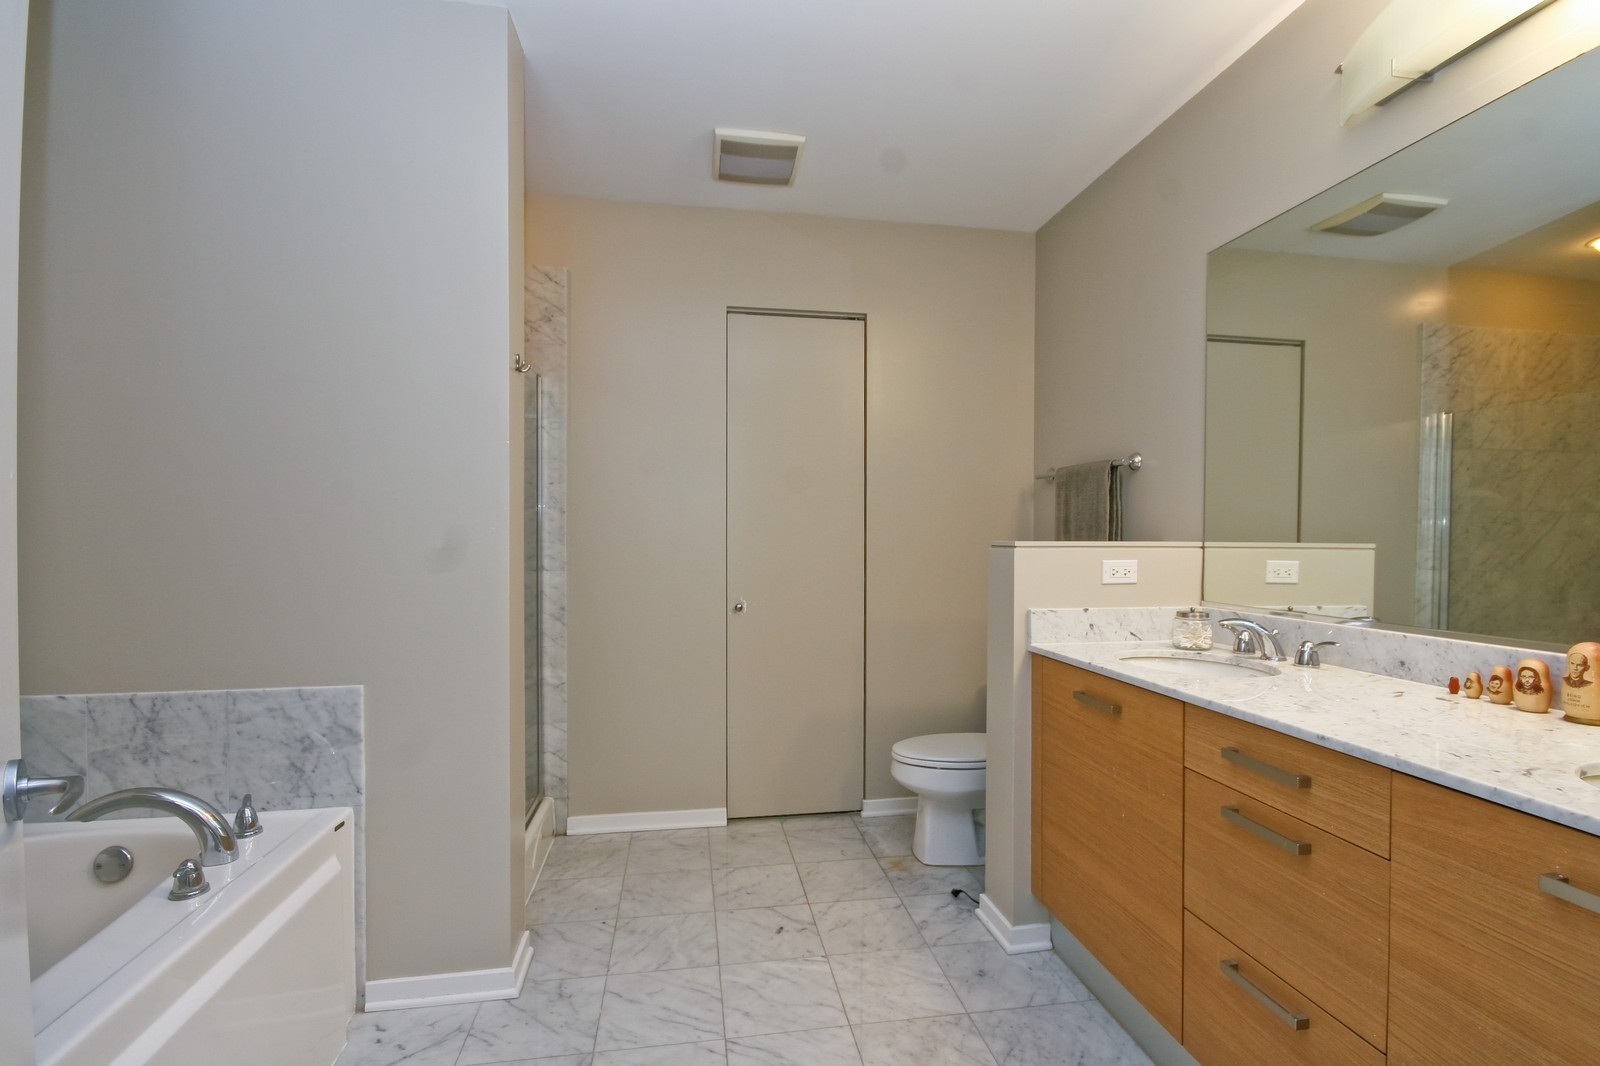 Real Estate Photography - 500 W Superior, Unit 1713, Chicago, IL, 60654 - Master Bathroom